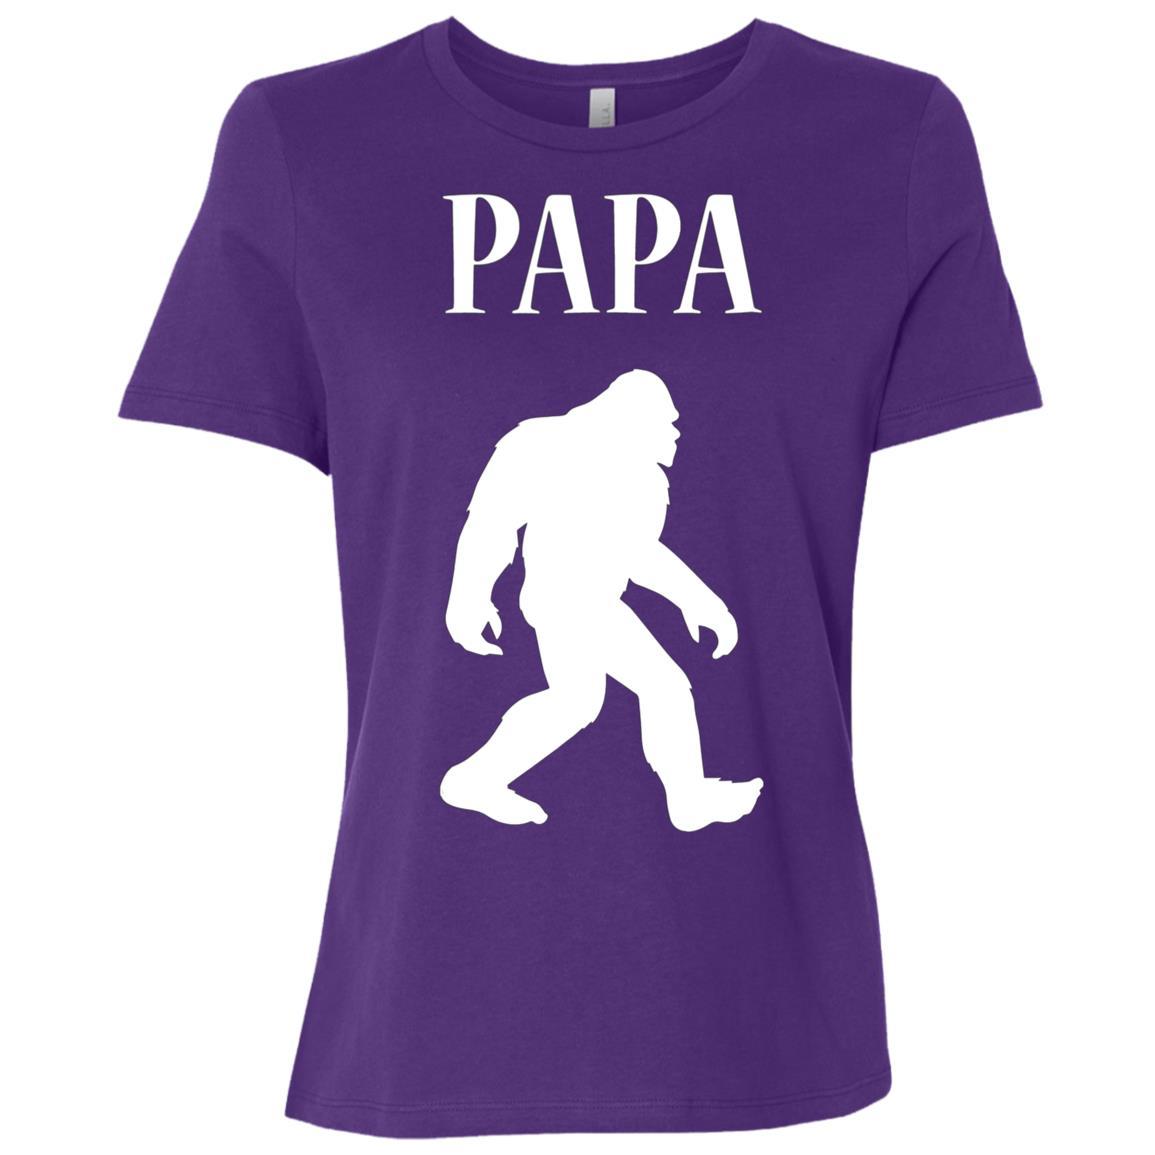 Mens PAPA BEAR SHIRT BIGFOOT FATHERS, DAD, DAD'S BIRTHDAY GIFT Women Short Sleeve T-Shirt